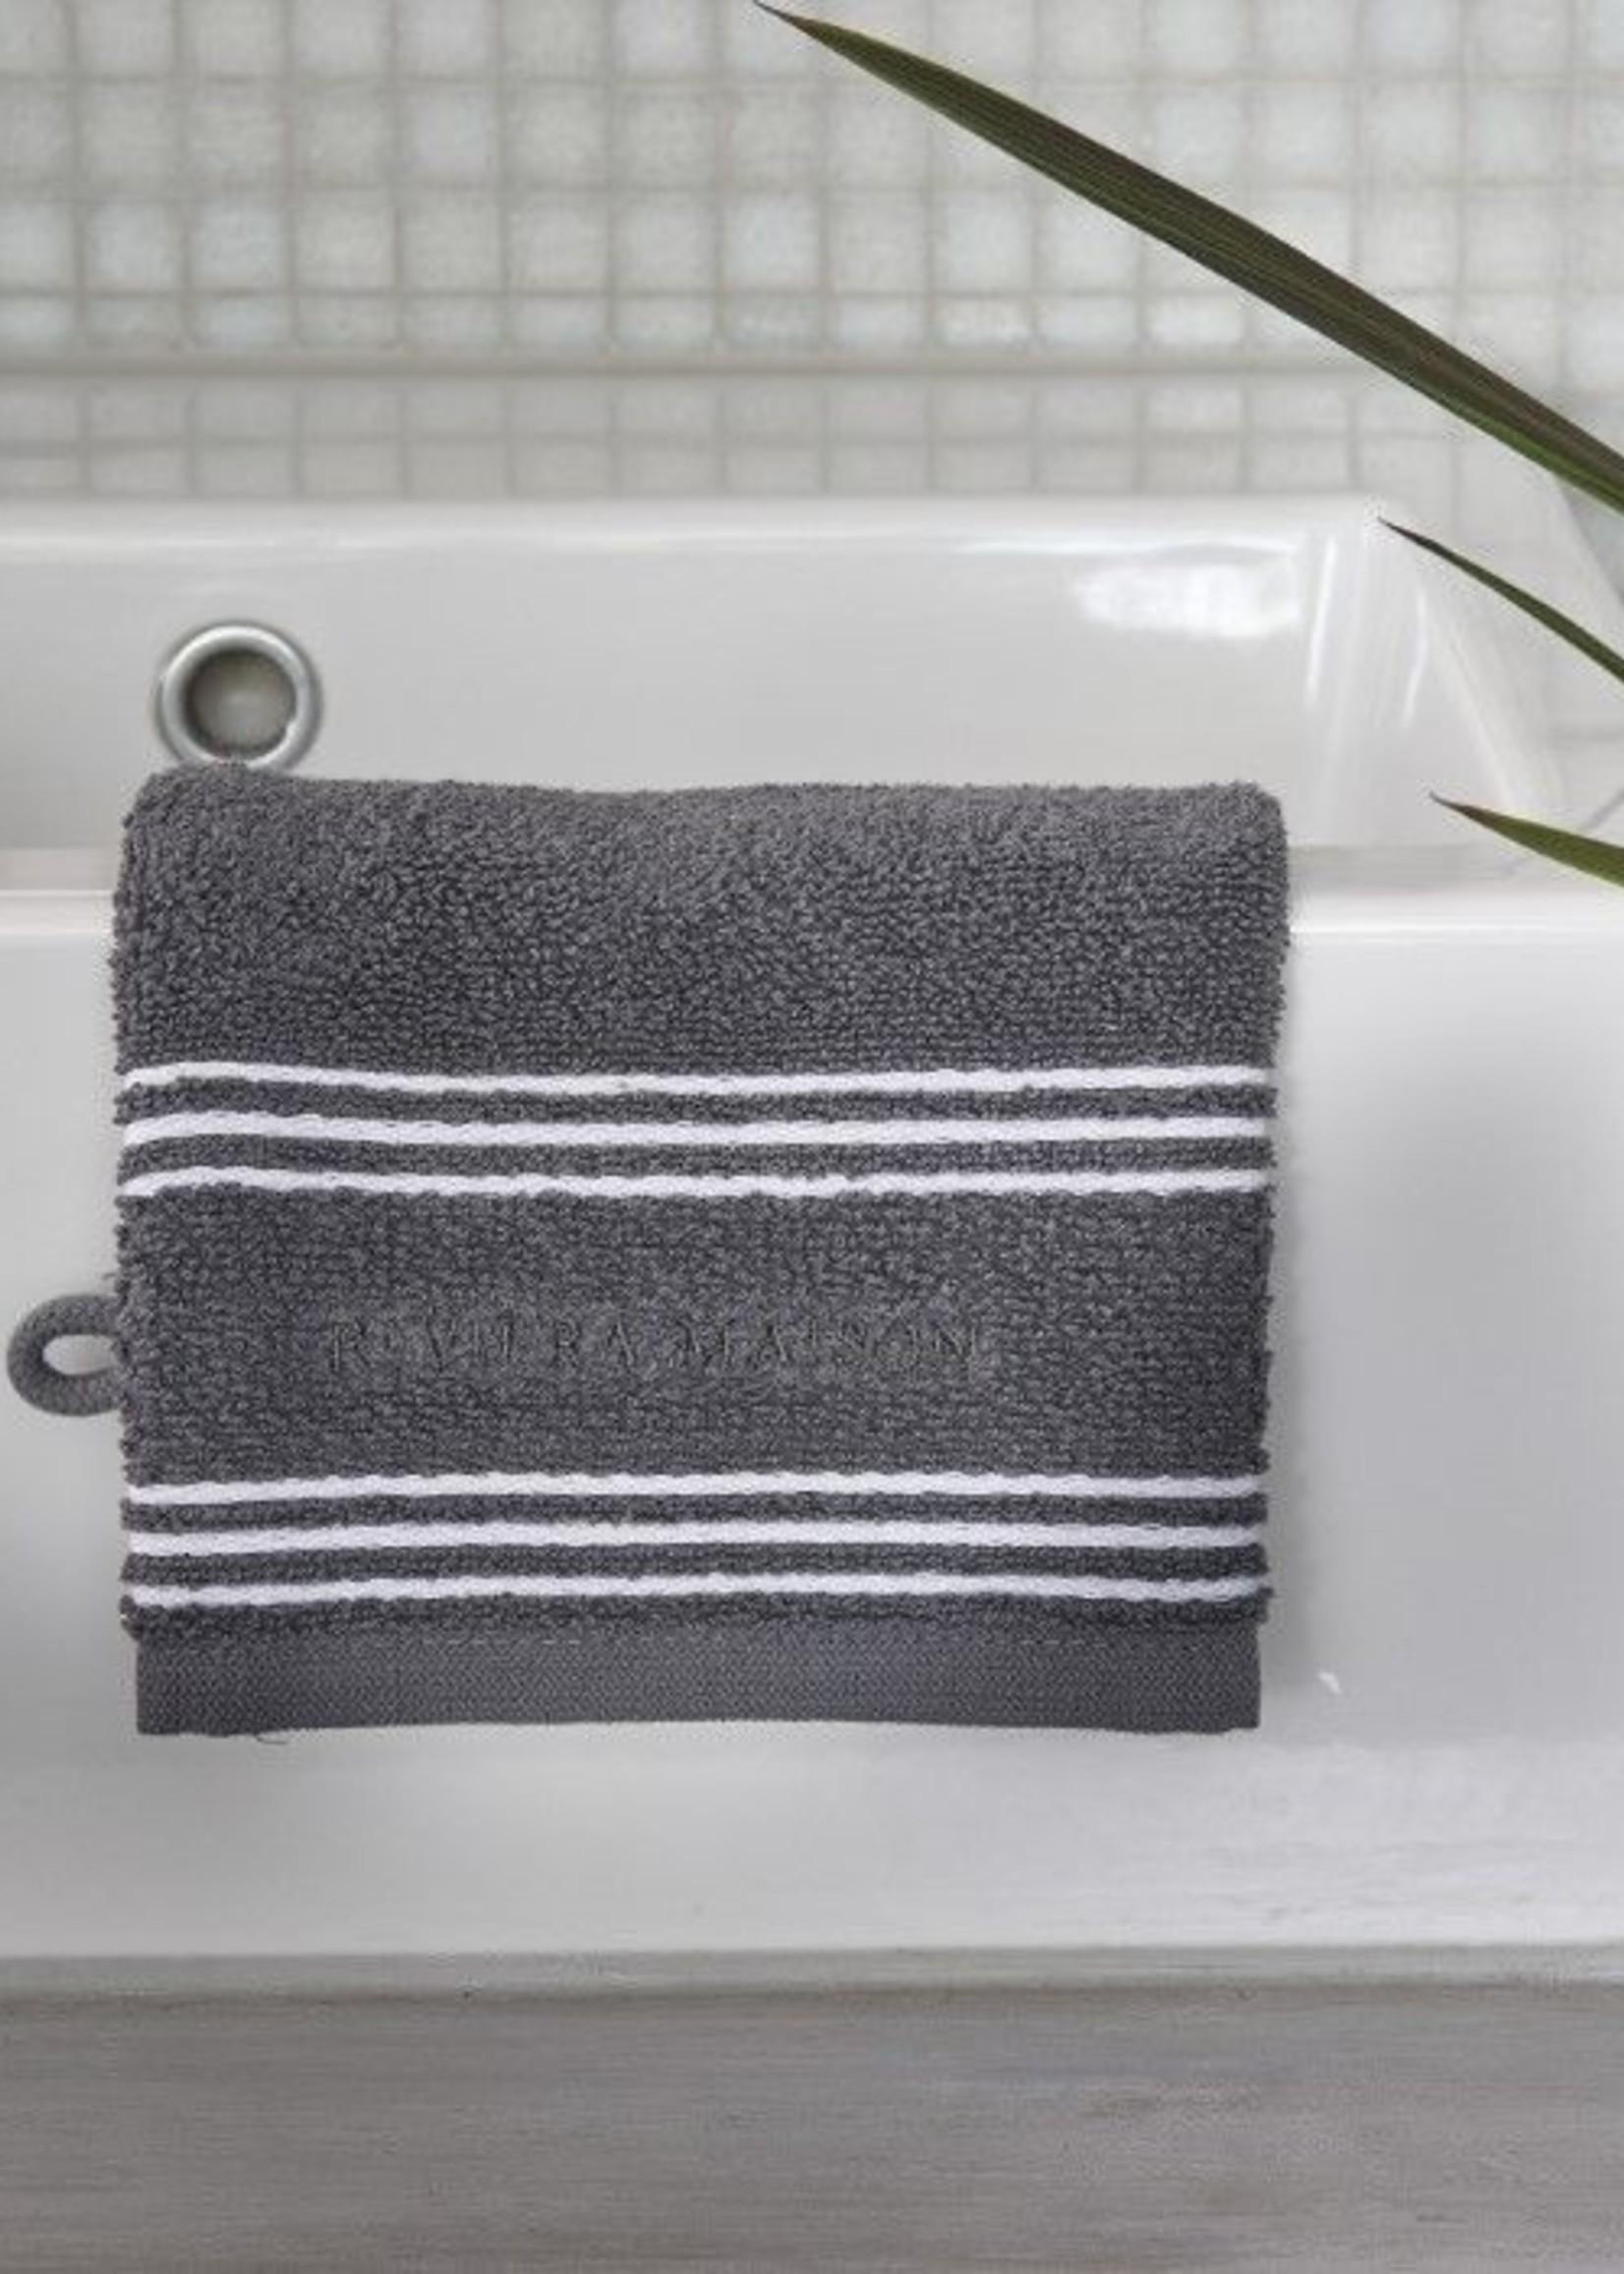 Riviera Maison Serene Washcloth anthracite